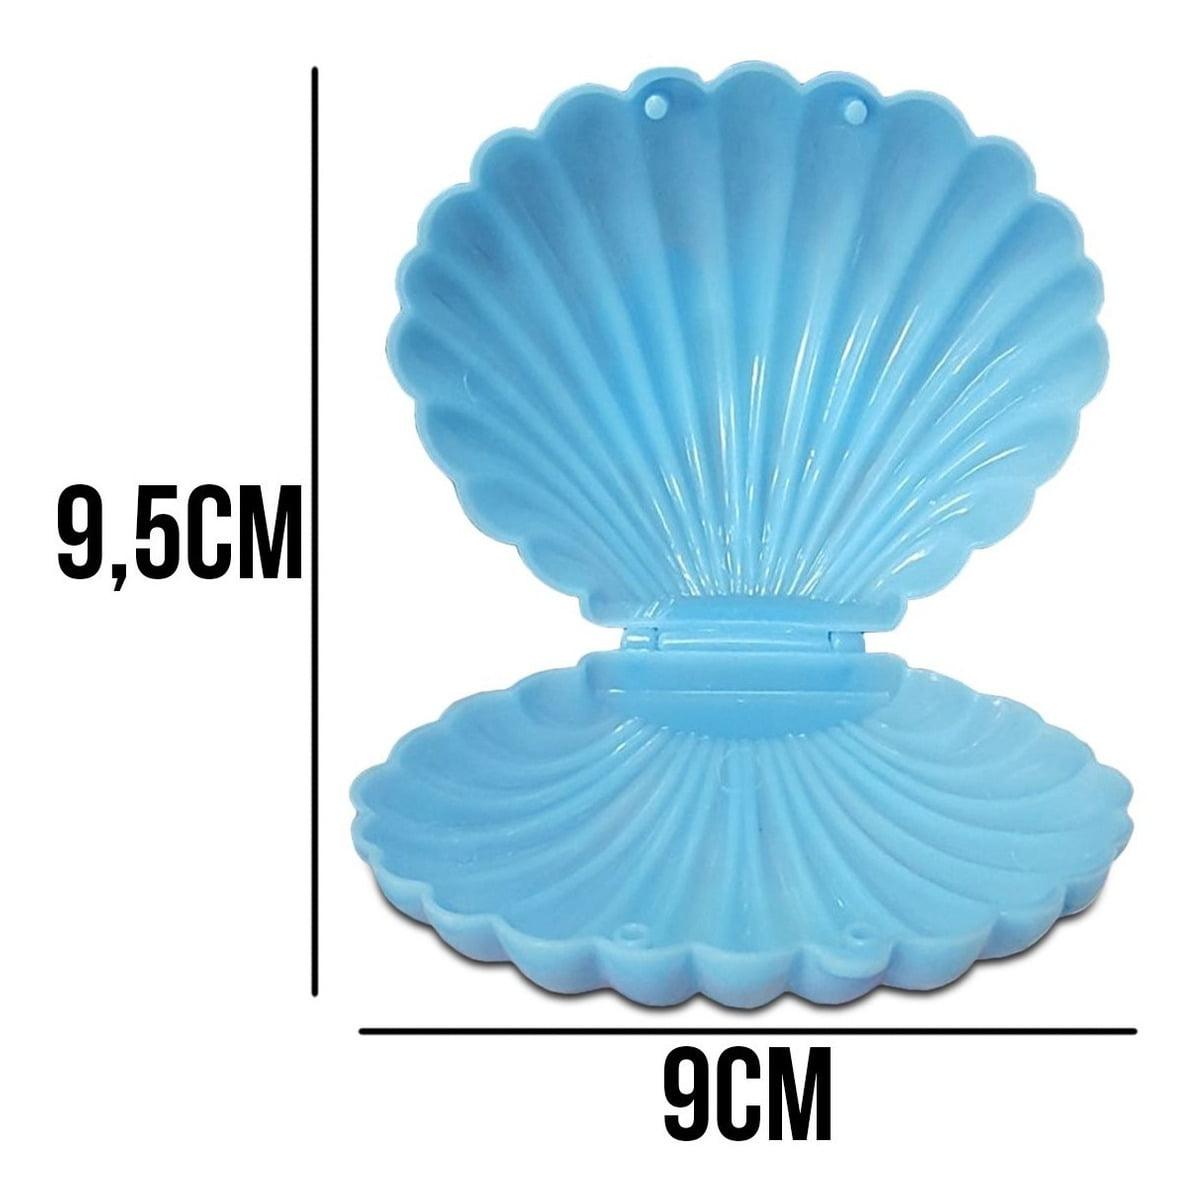 20 Concha Caixinha Plástico Lembrancinha Festa